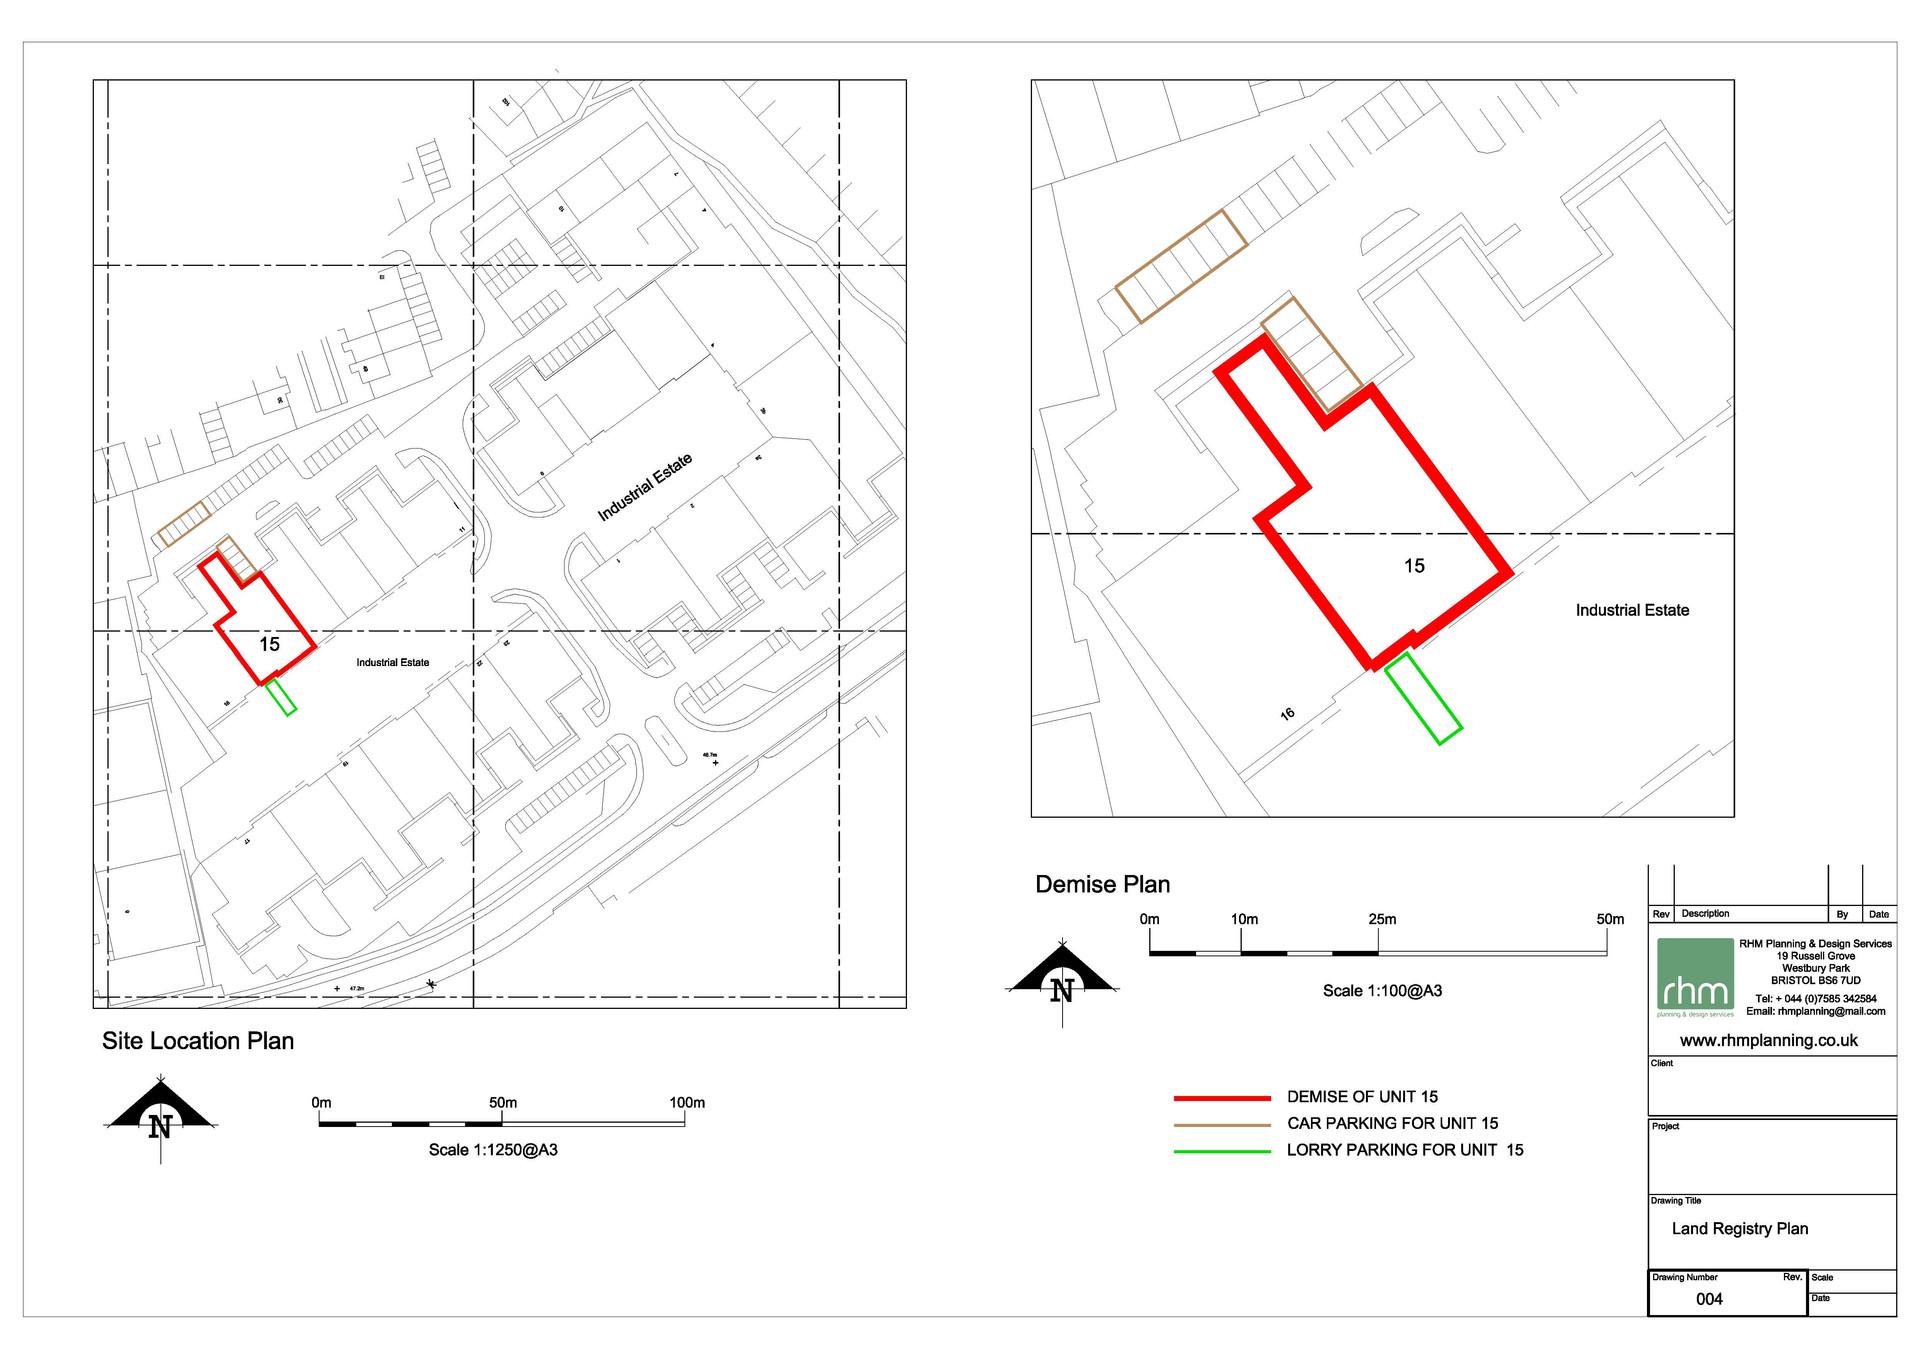 LAND REGISTRY PLAN [Example 004].jpg